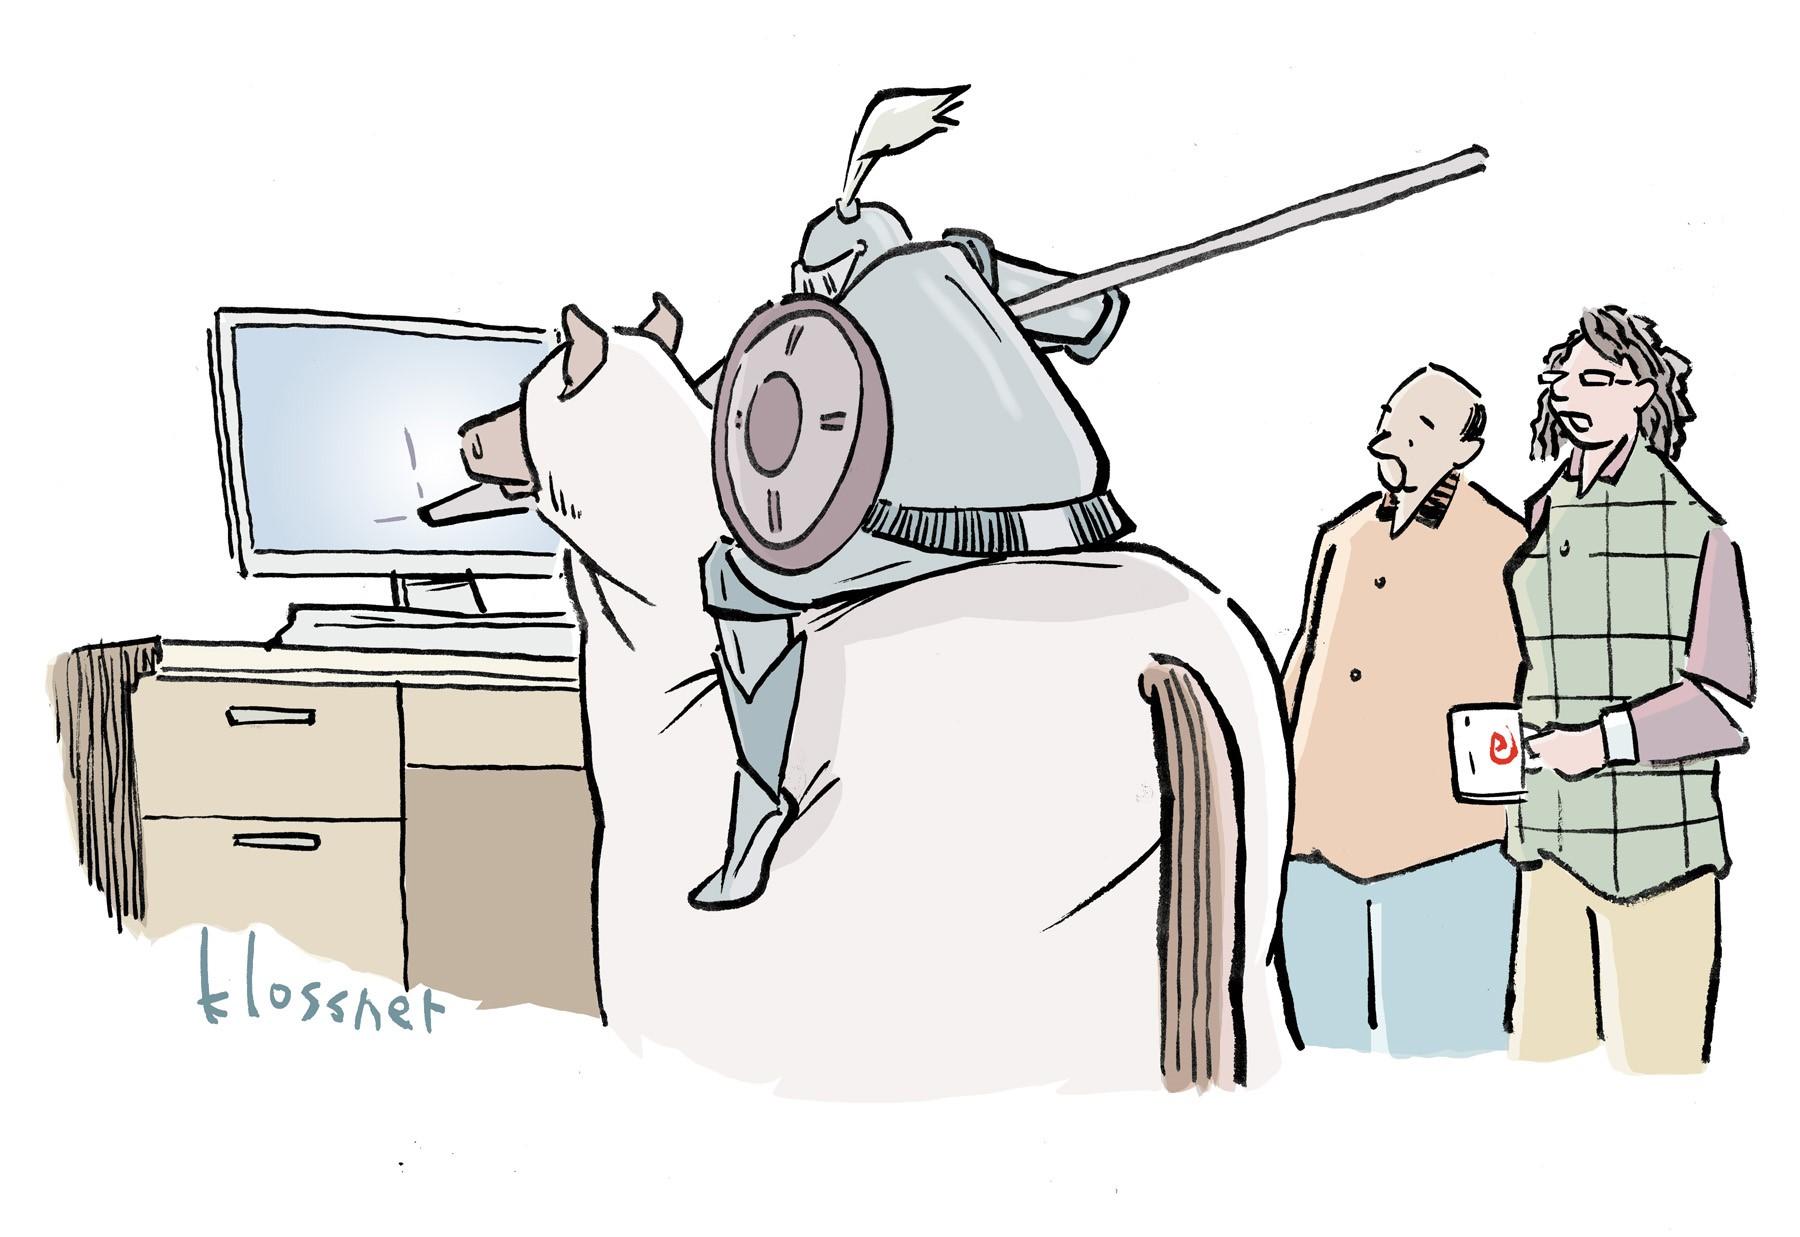 We provide the cartoon. You write the caption!